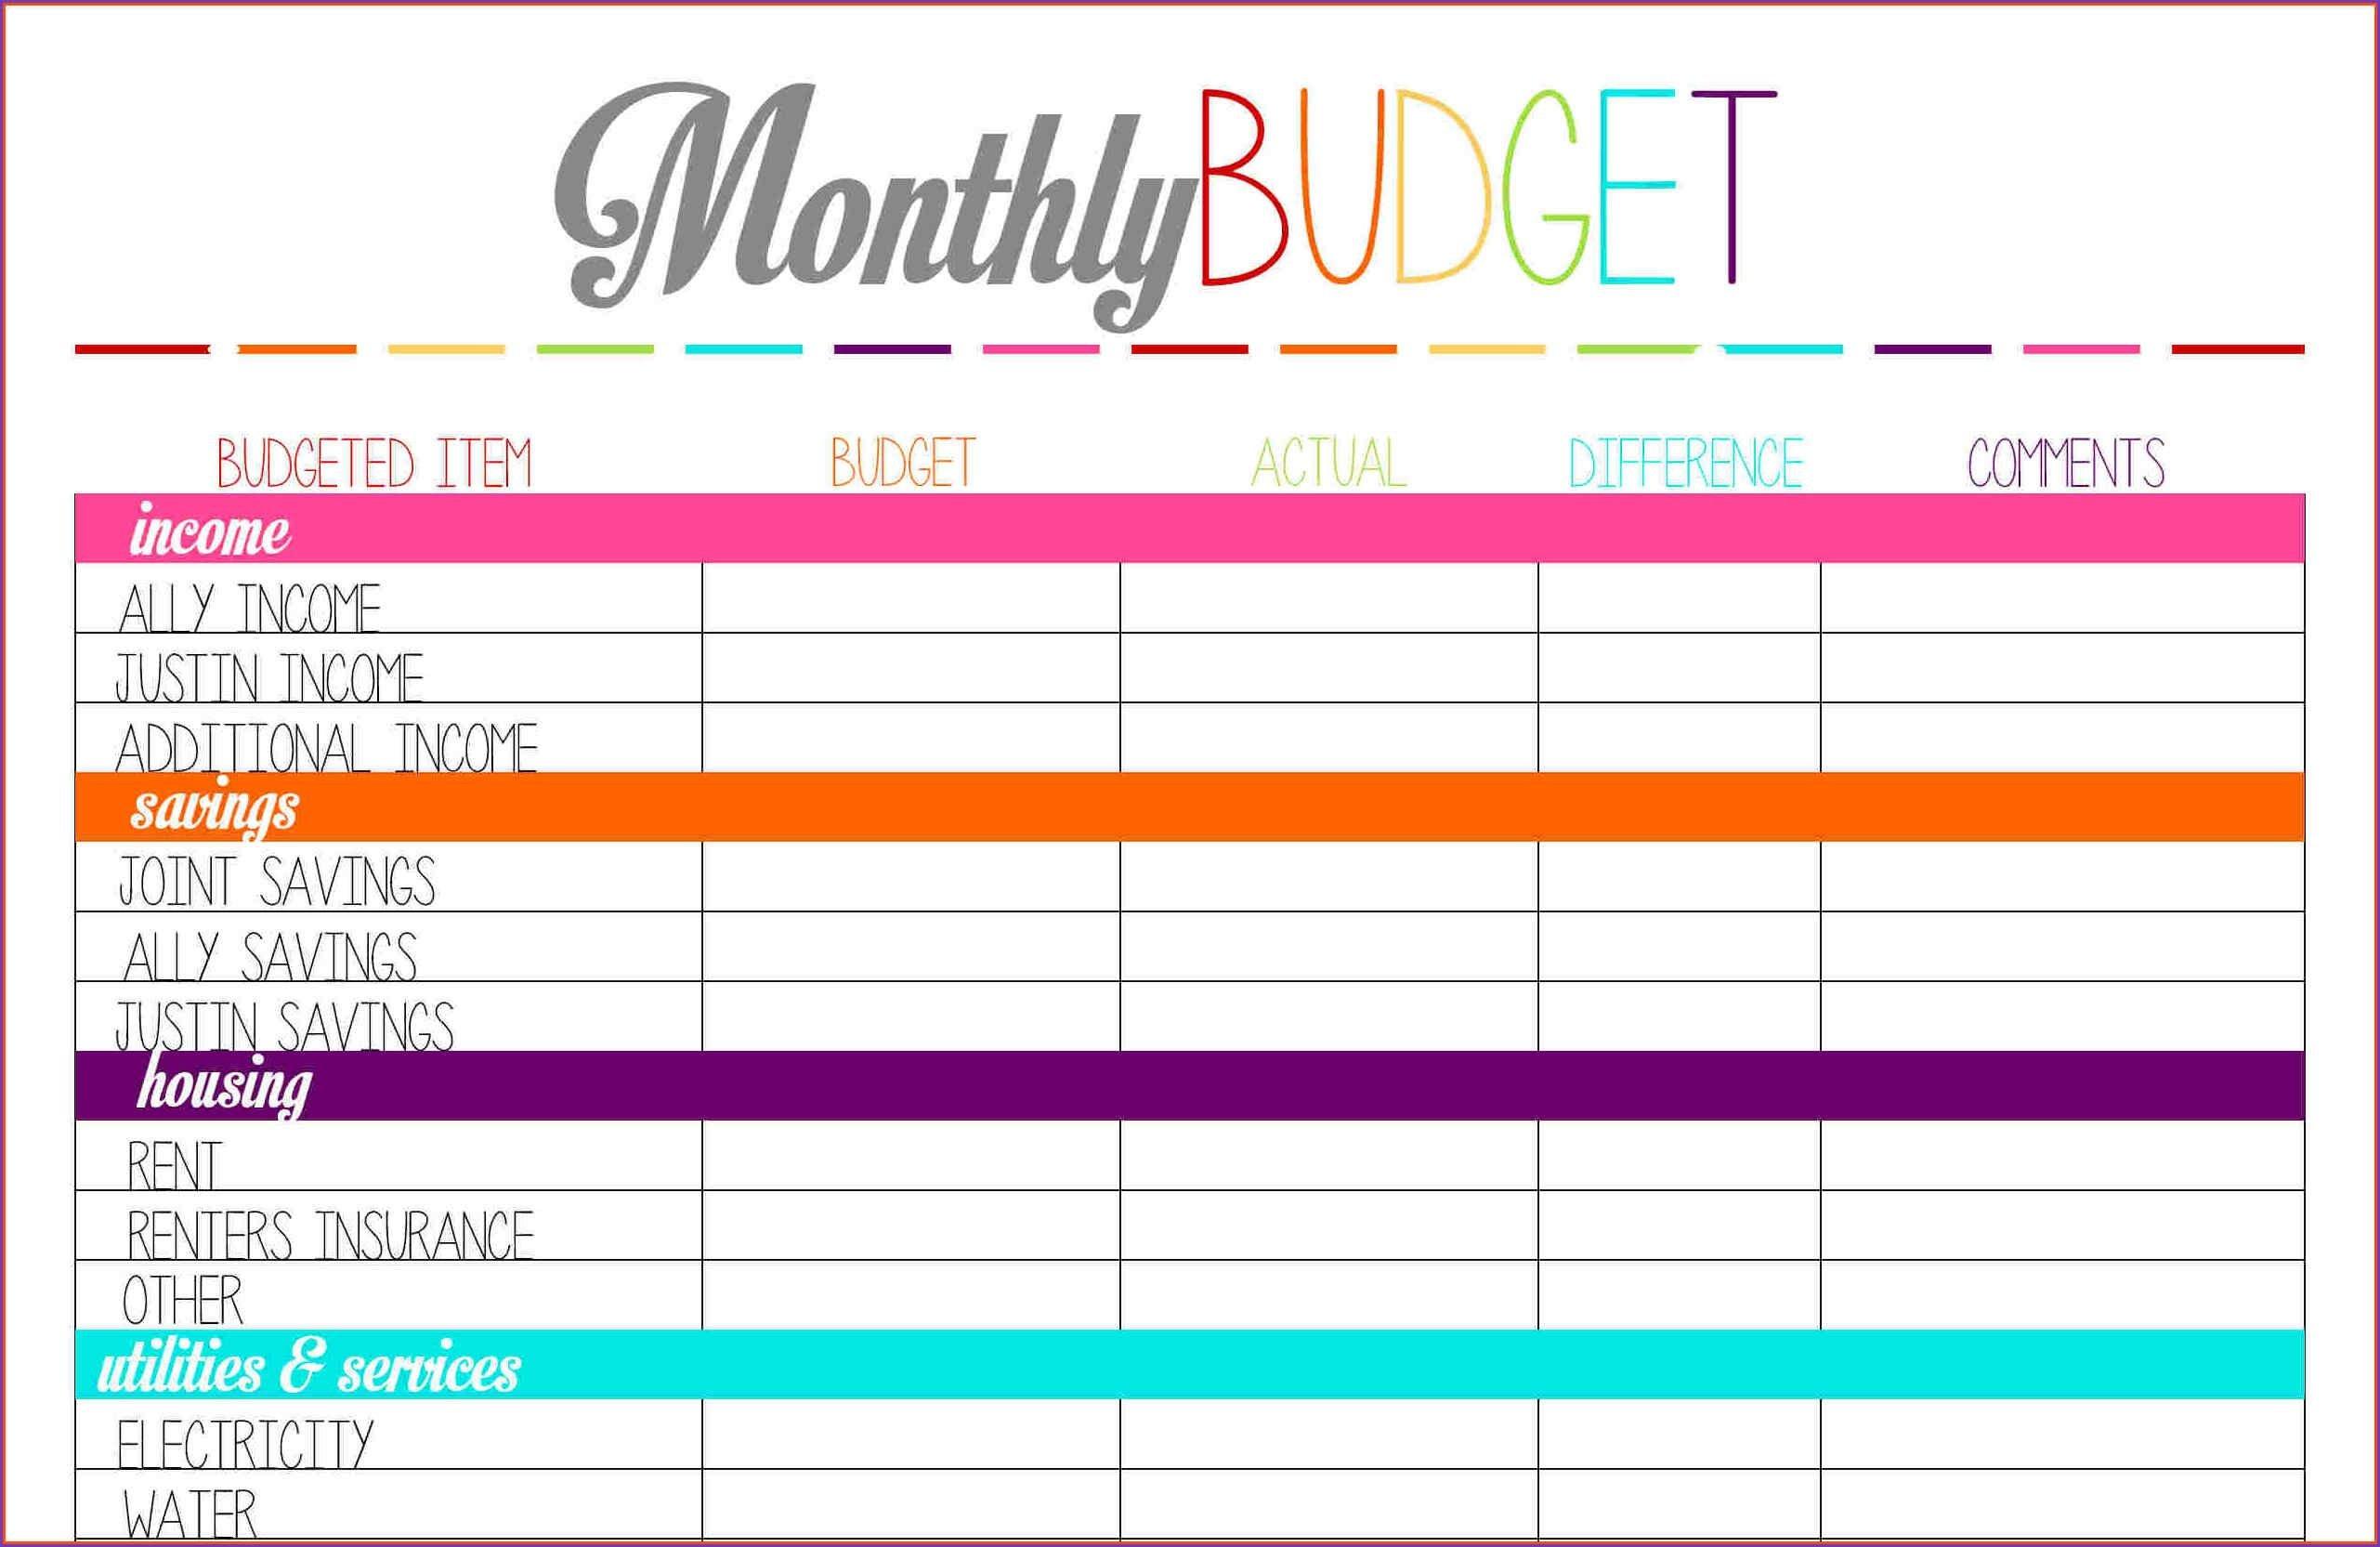 012 Printable Budget Worksheet Template Plan Unforgettable Templates Throughout Printable Budget Worksheet